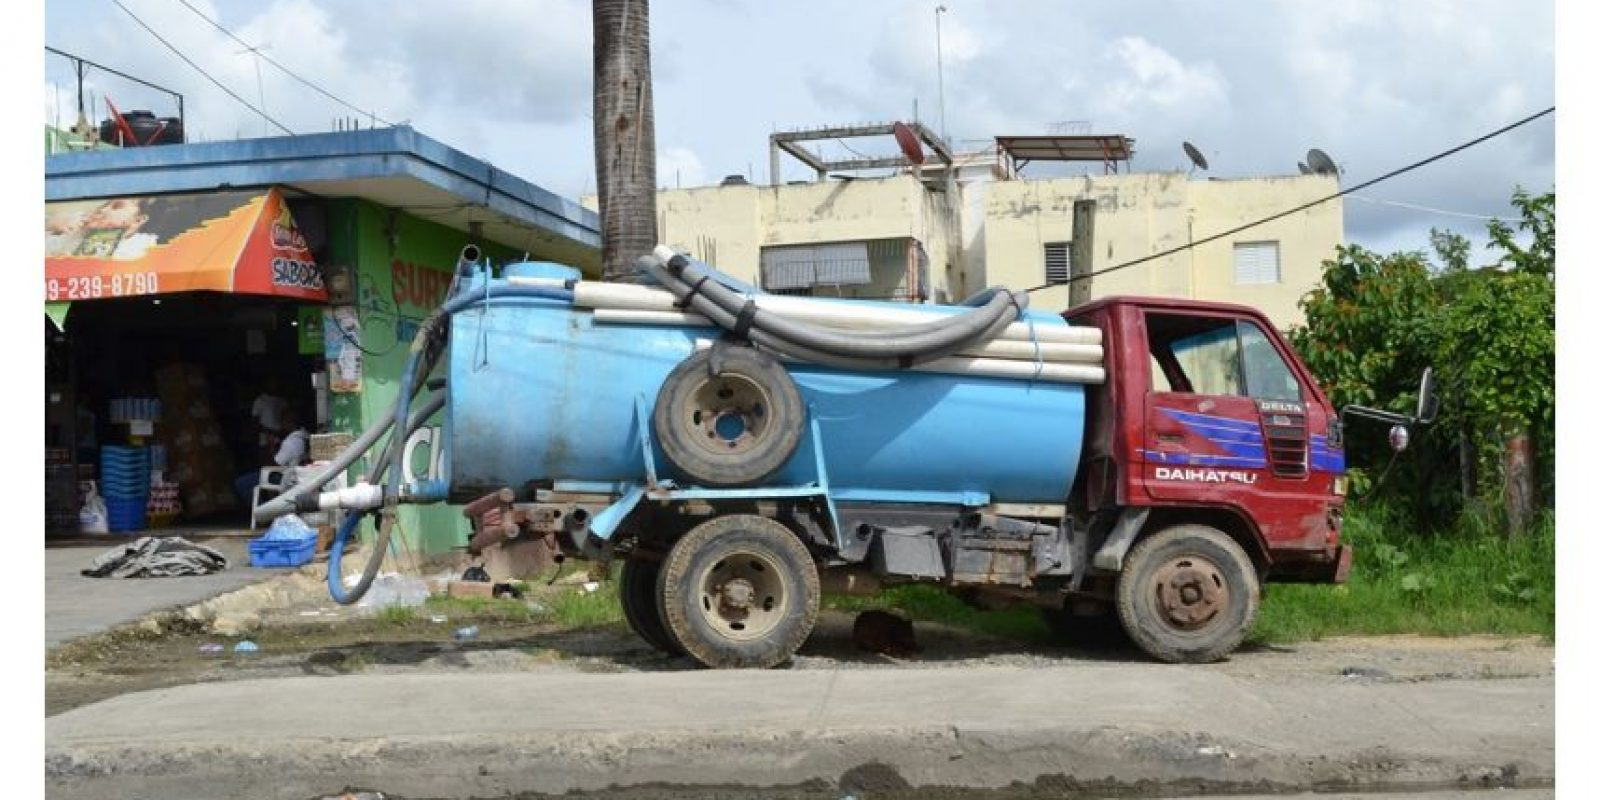 Descuido, basura, falta de agua y calles dañadas configuran el caótico panorama urbano de SDN/ Fotos: Mario de Peña